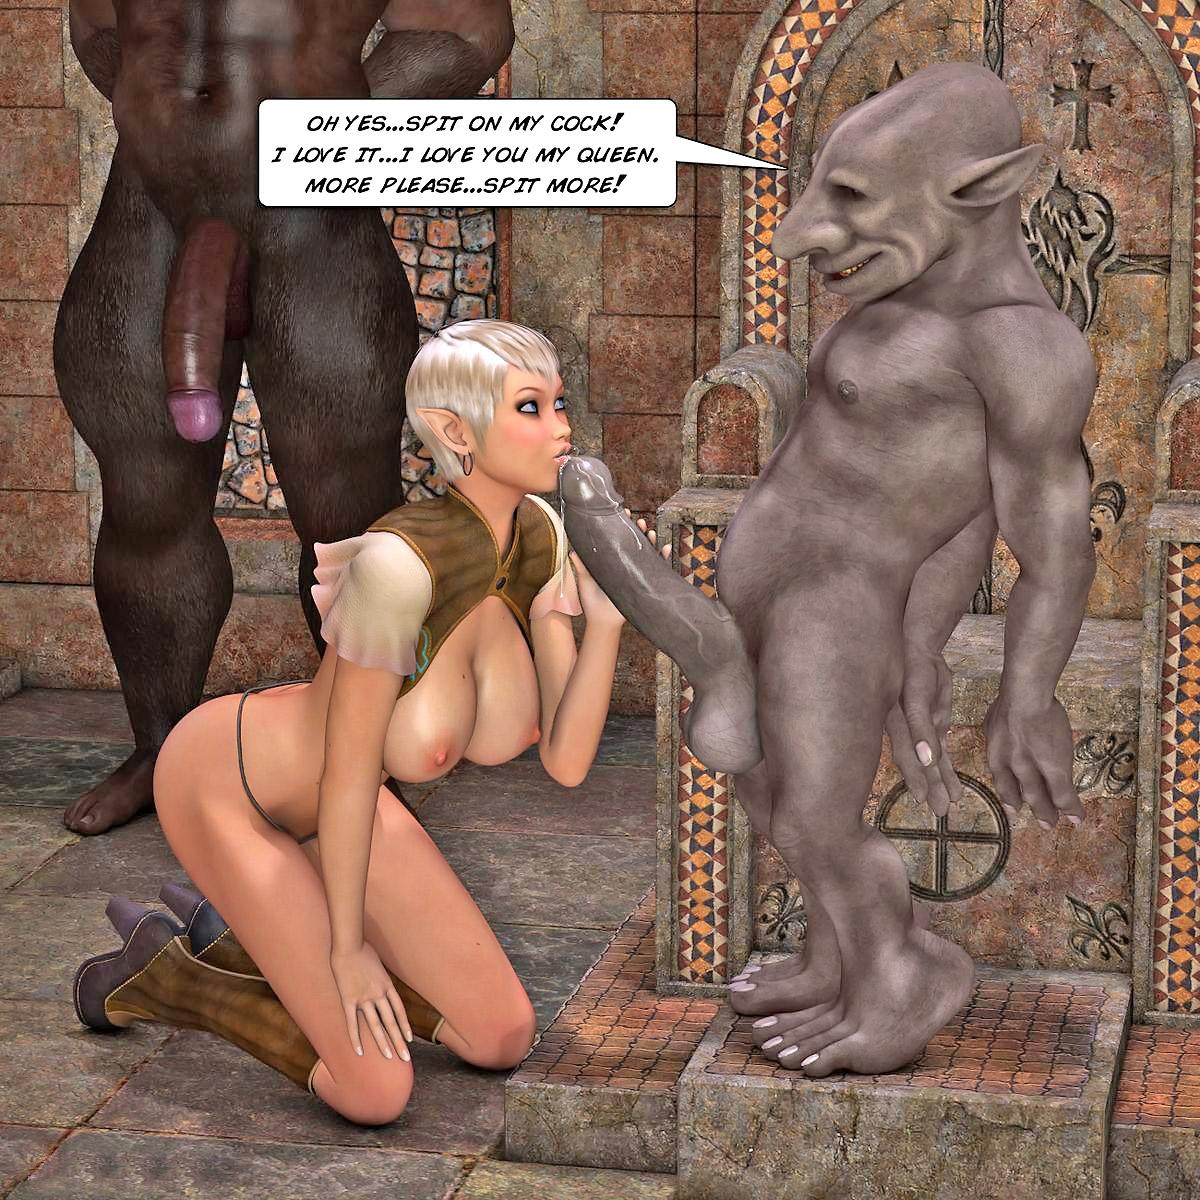 Monster fantasyporn download nude galleries